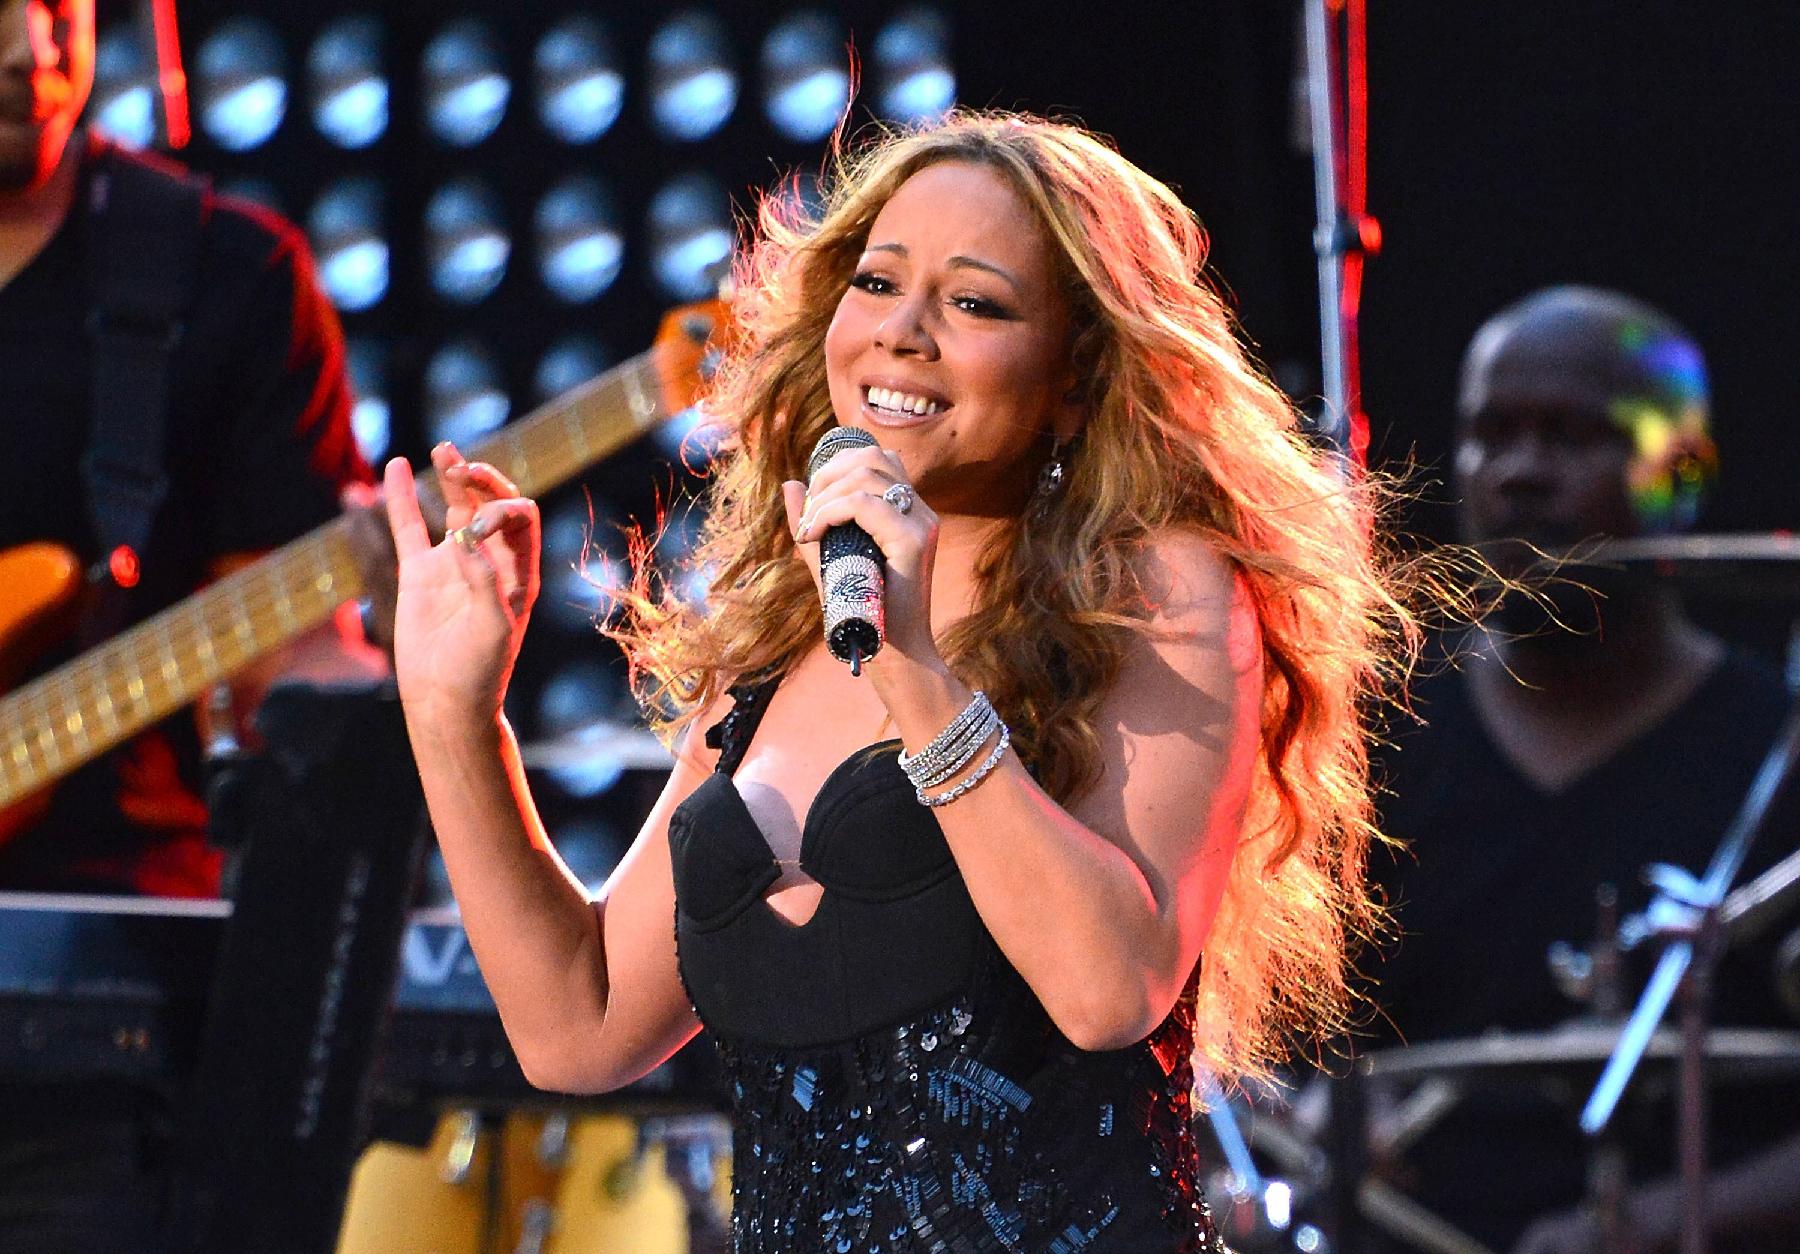 Mariah Carey, Janelle Monae, Jennifer Hudson to Perform at BET Honors